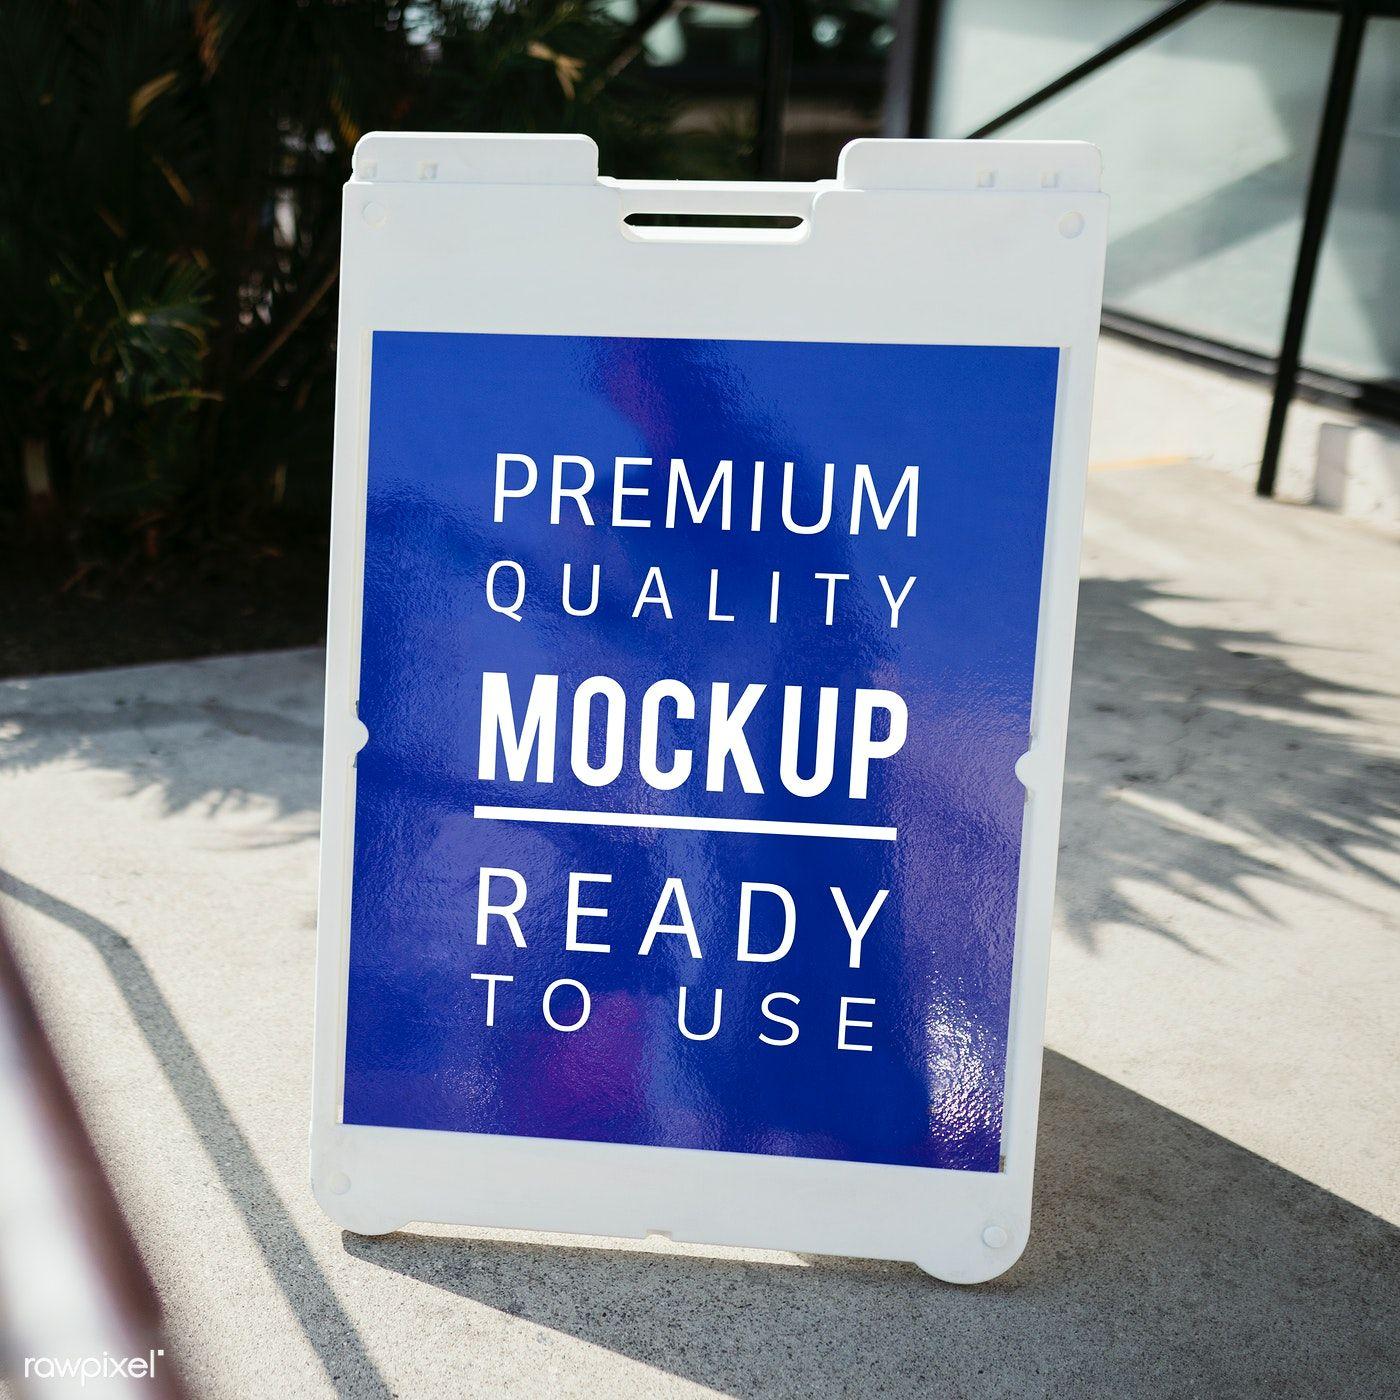 White Floor Stand Sign Mockup Outside A Restaurant Free Image By Rawpixel Com Mckinsey Sign Mockup Mockup Flyer Mockup